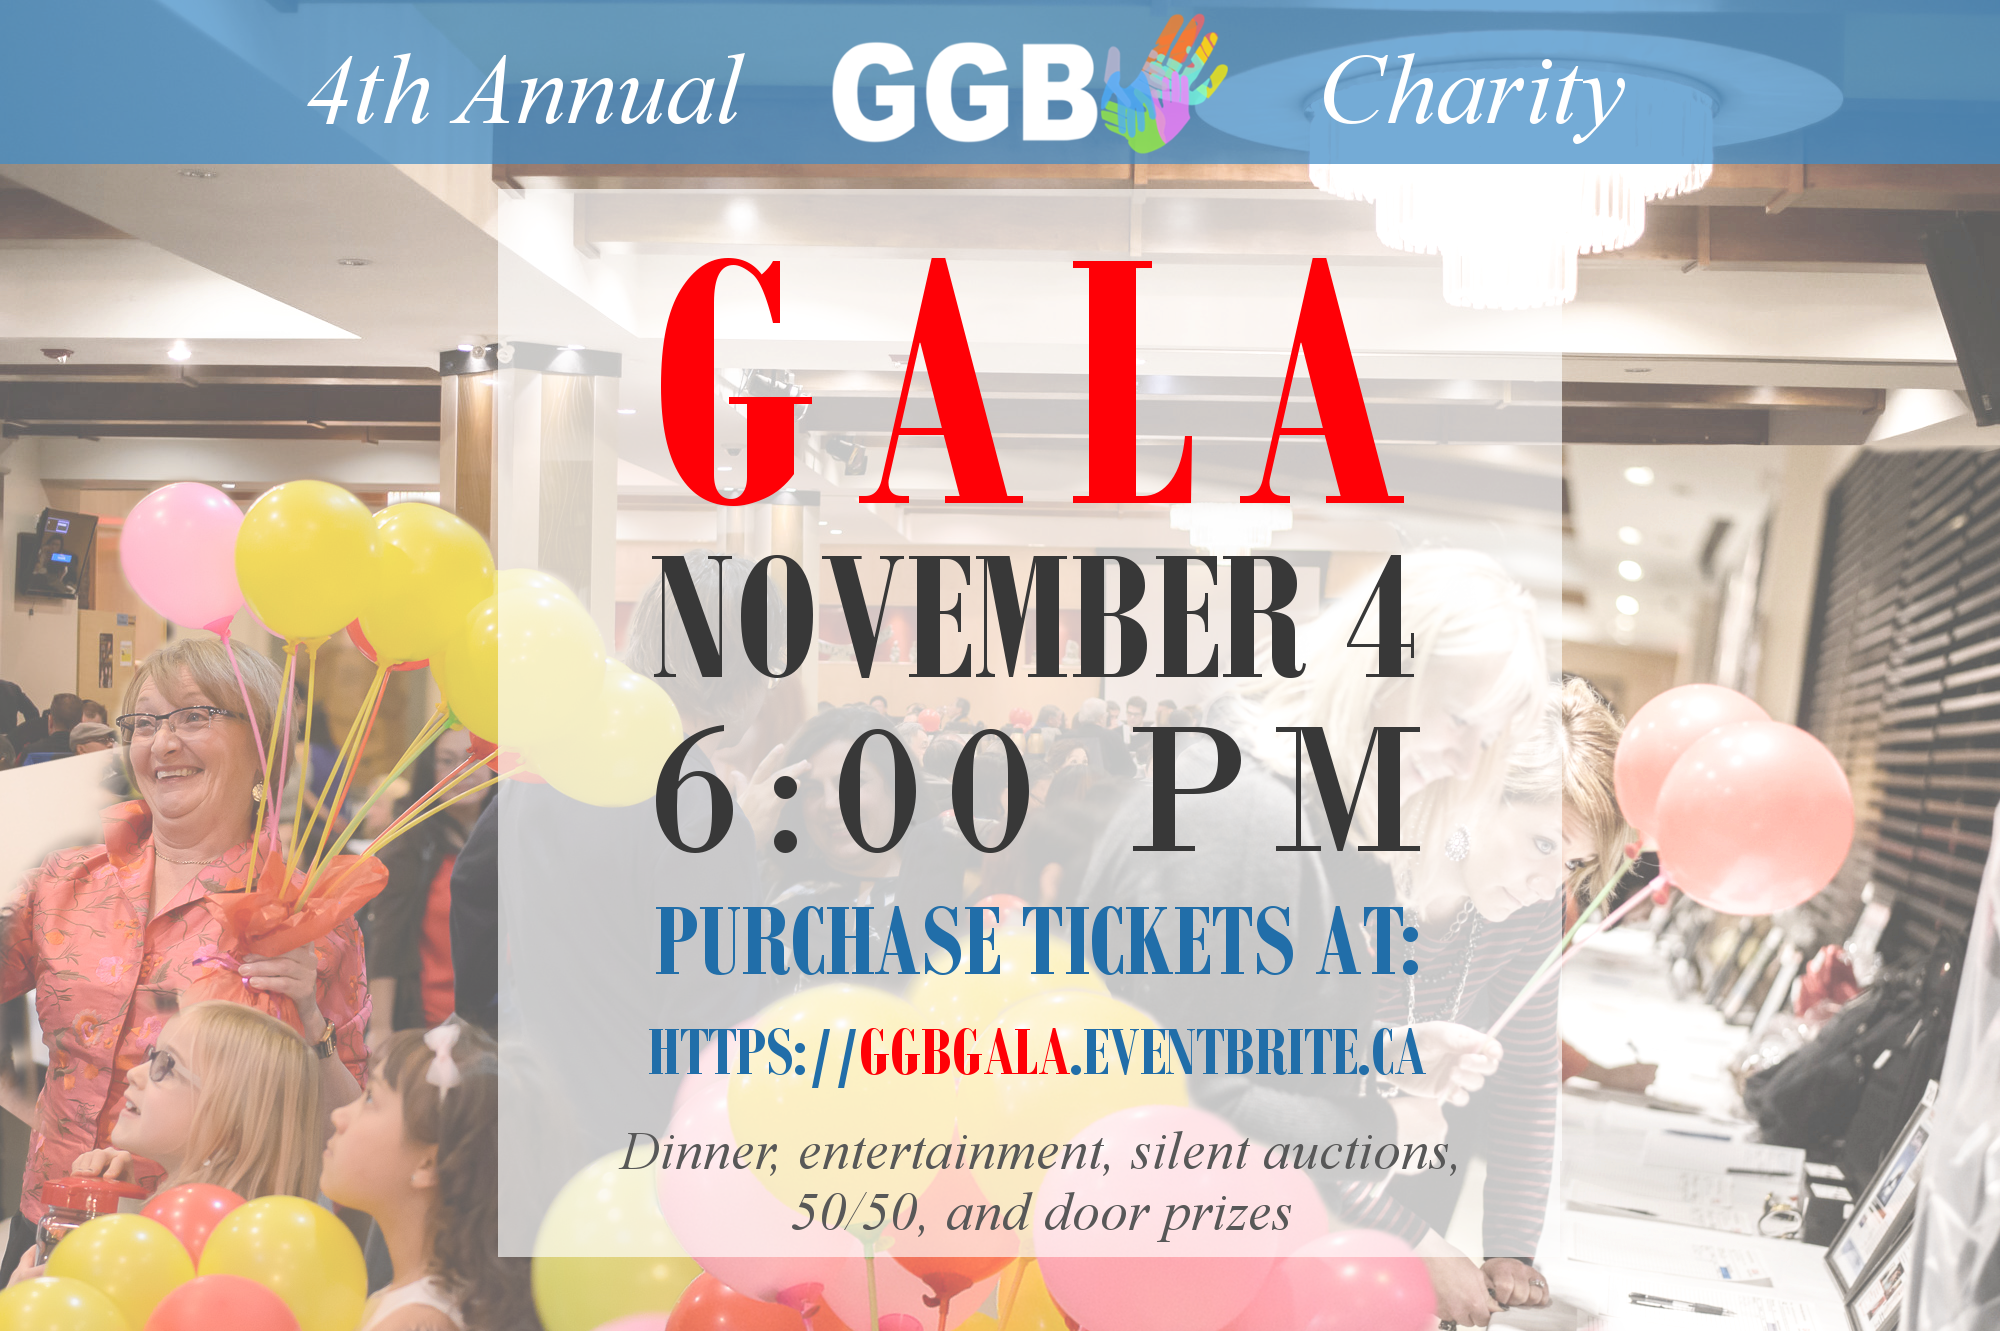 4th Annual GGB Fundraising Gala